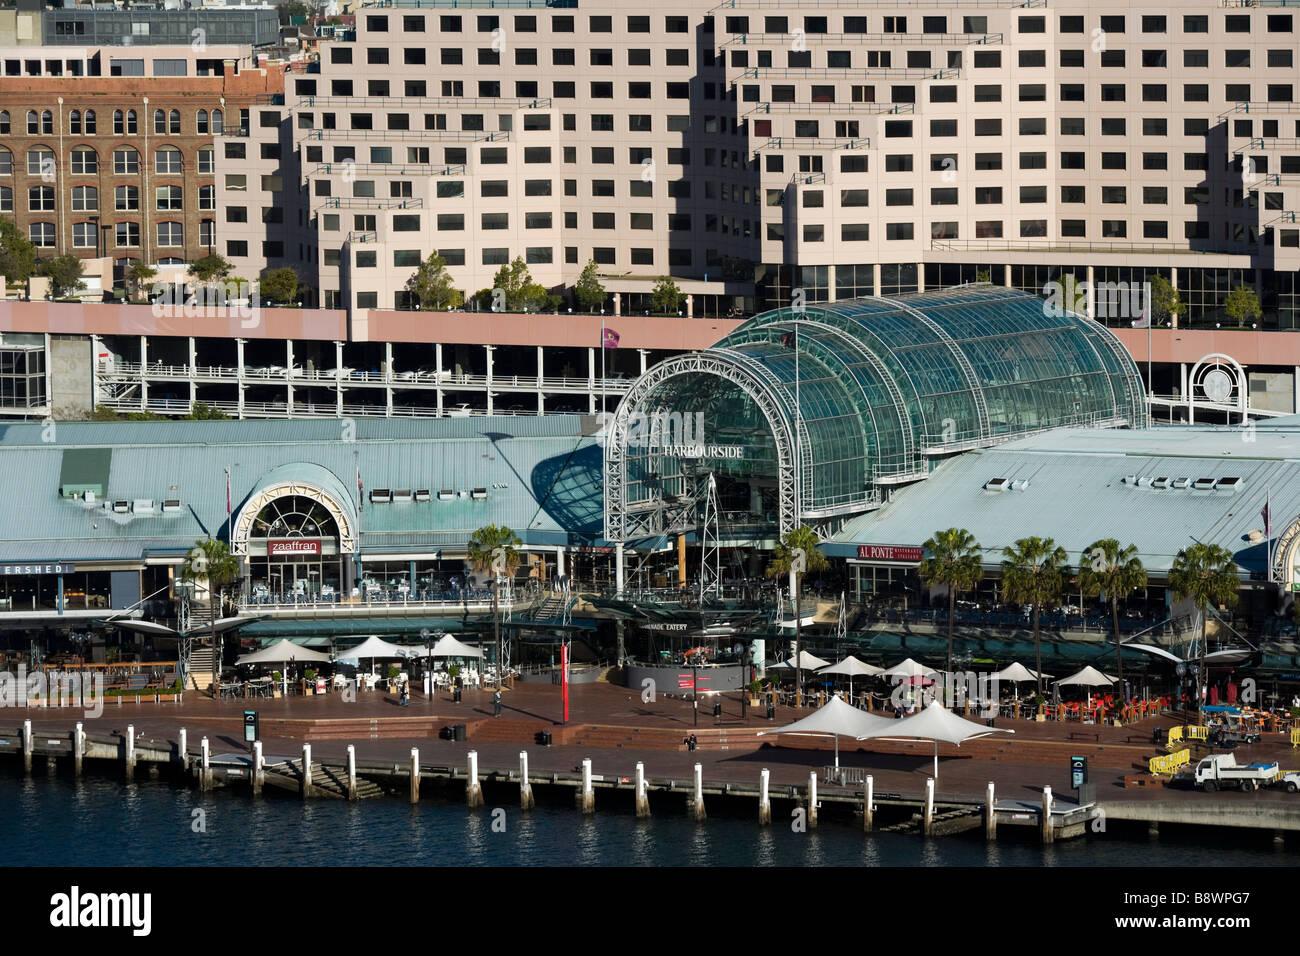 Sydney Australia  Novotel Hotel and Harbourside Shopping